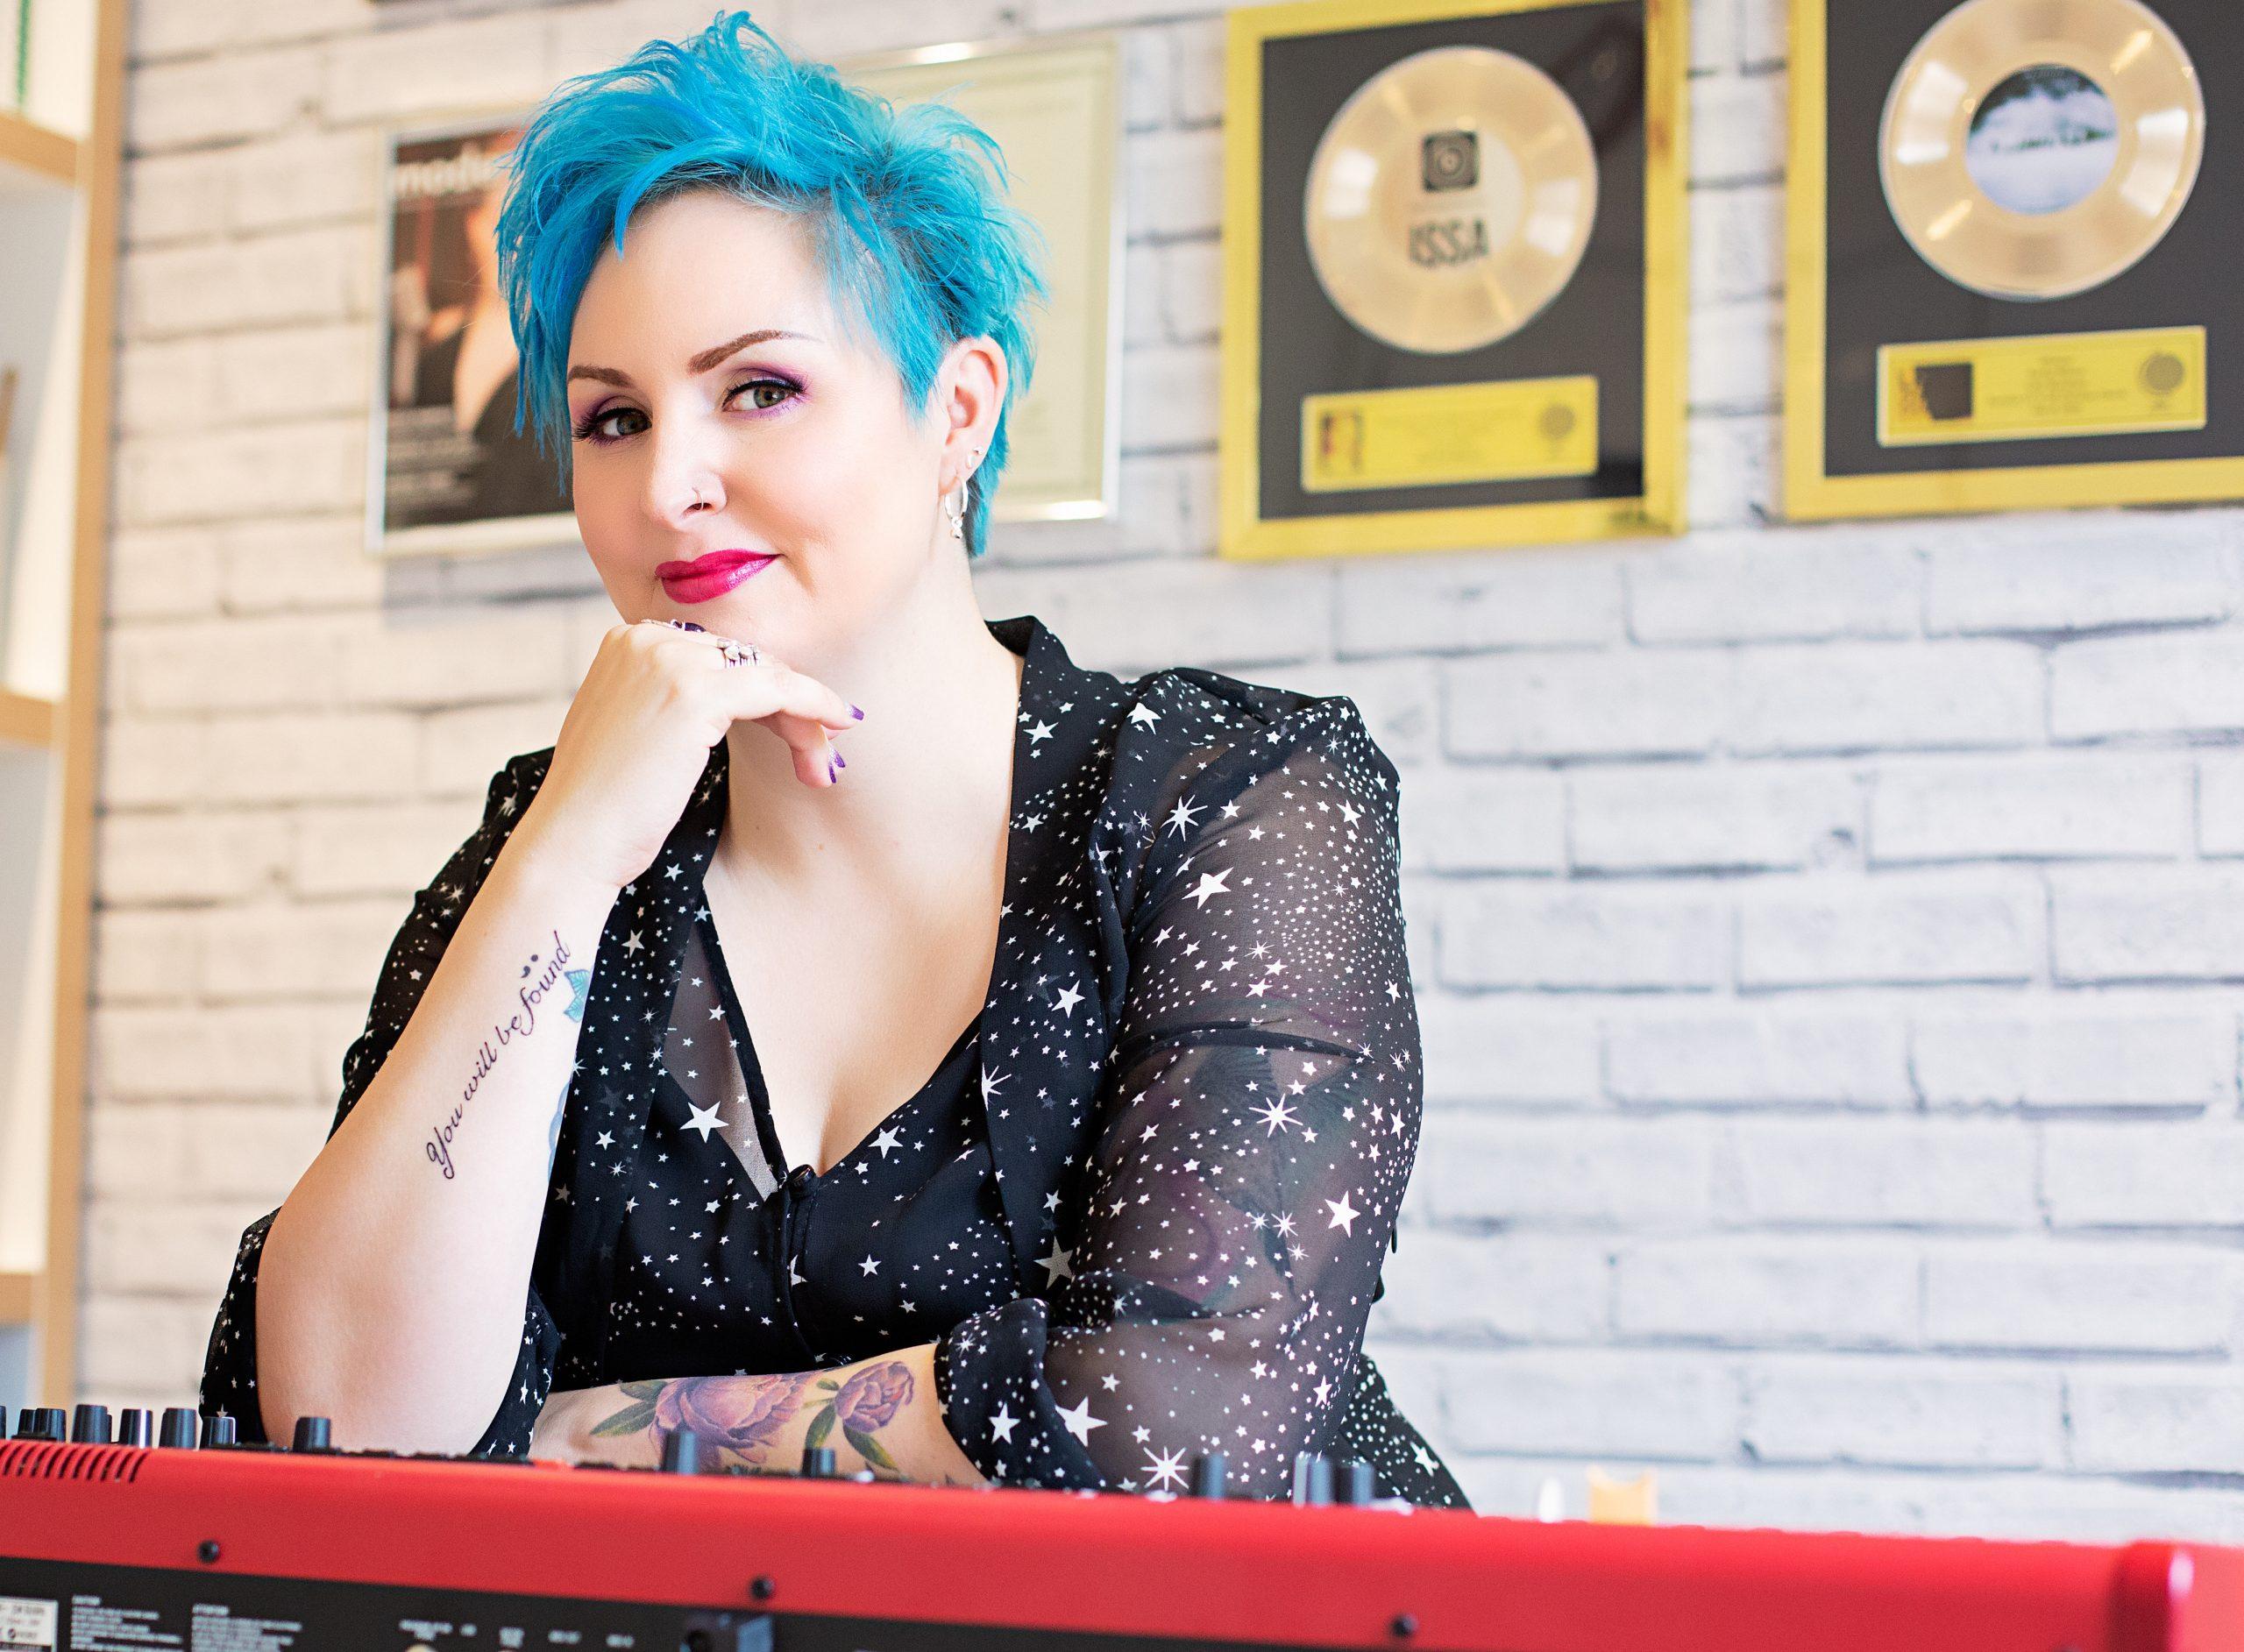 Award winning singer and songwriter, Rachel Mason